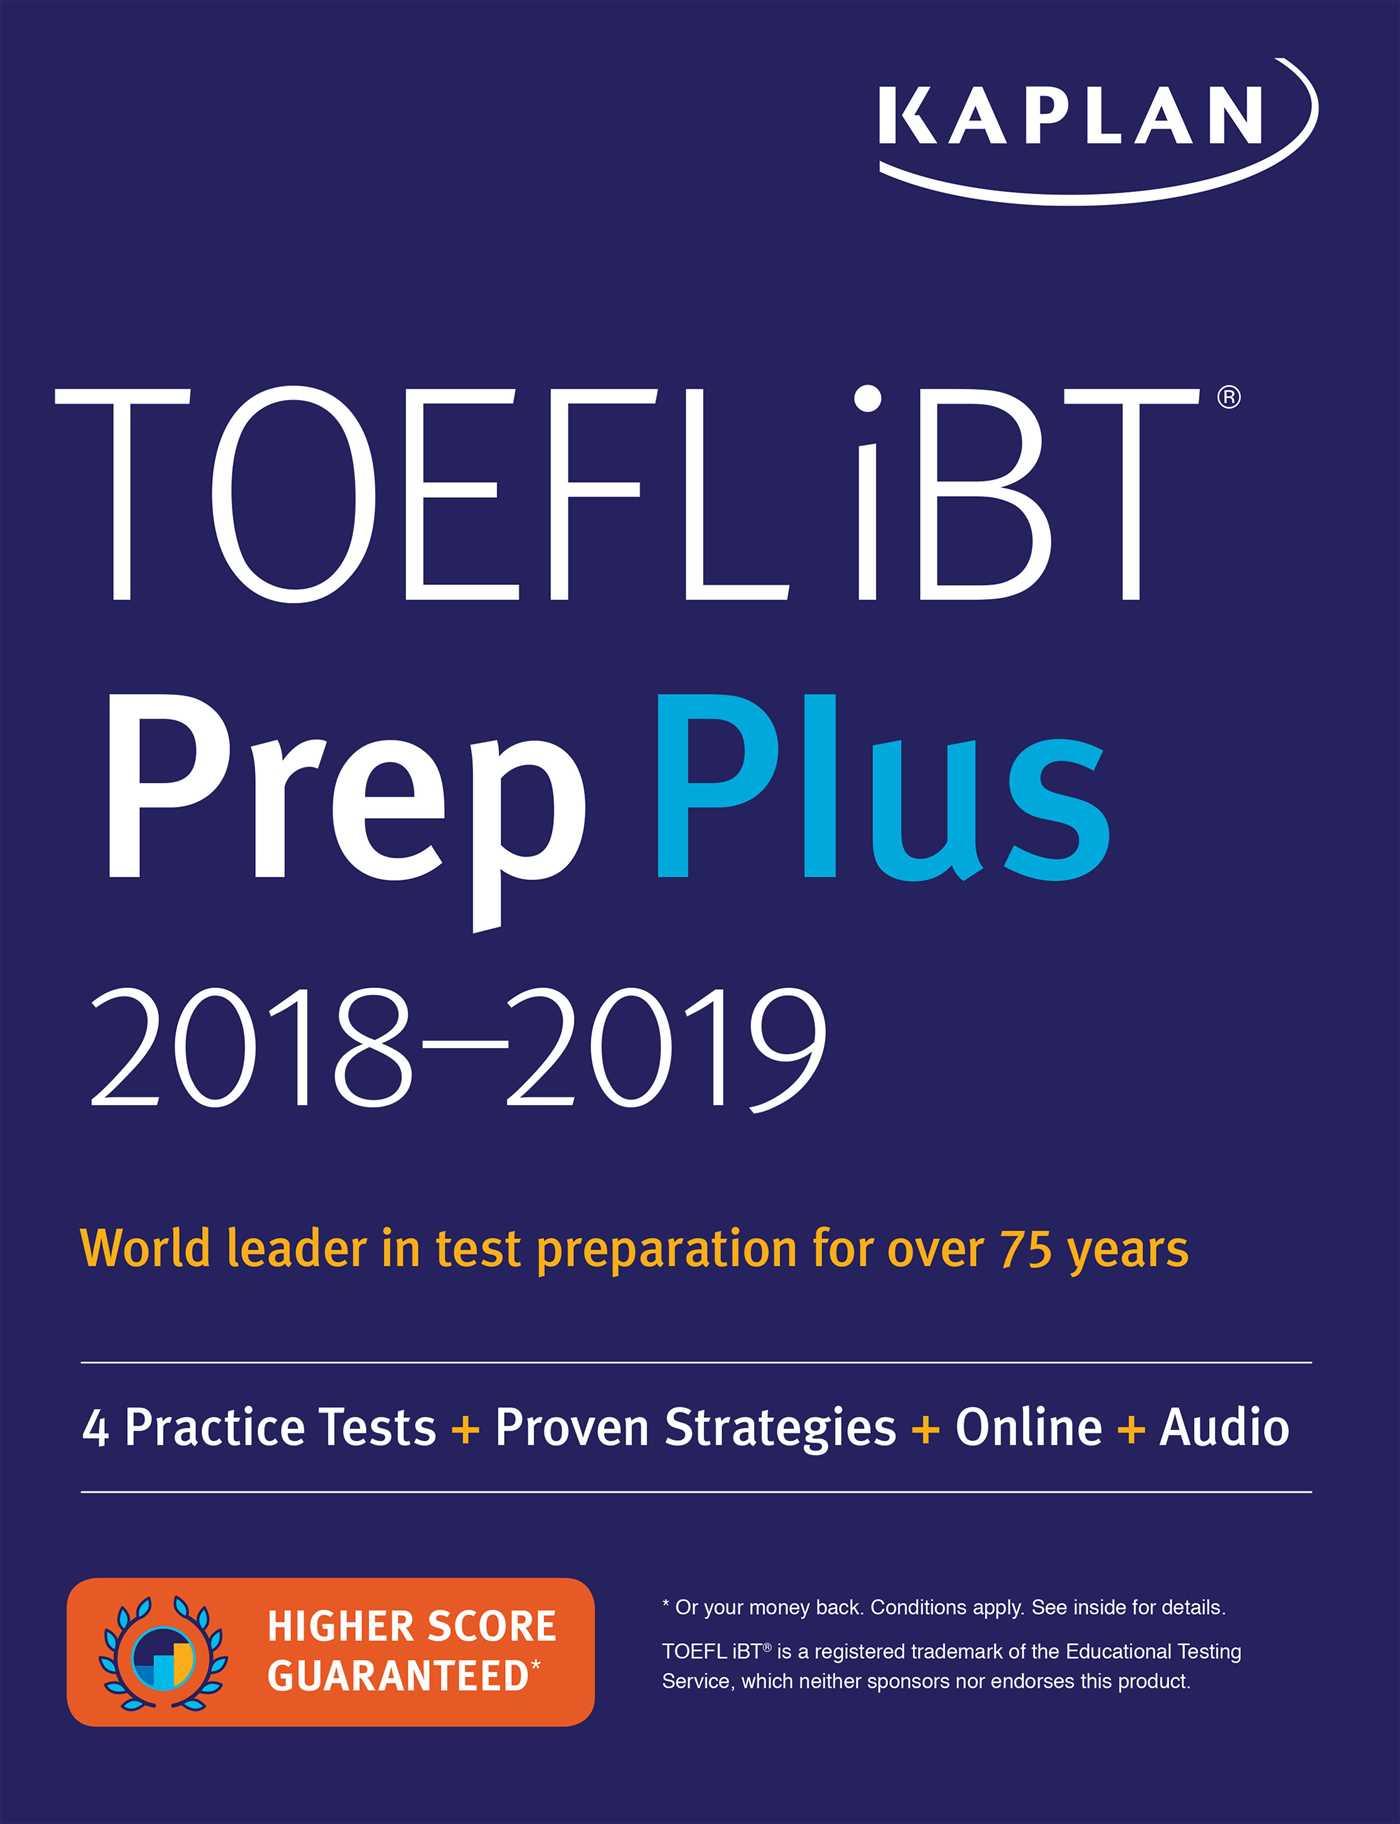 Book Cover Image (jpg): TOEFL iBT Prep Plus 2018-2019